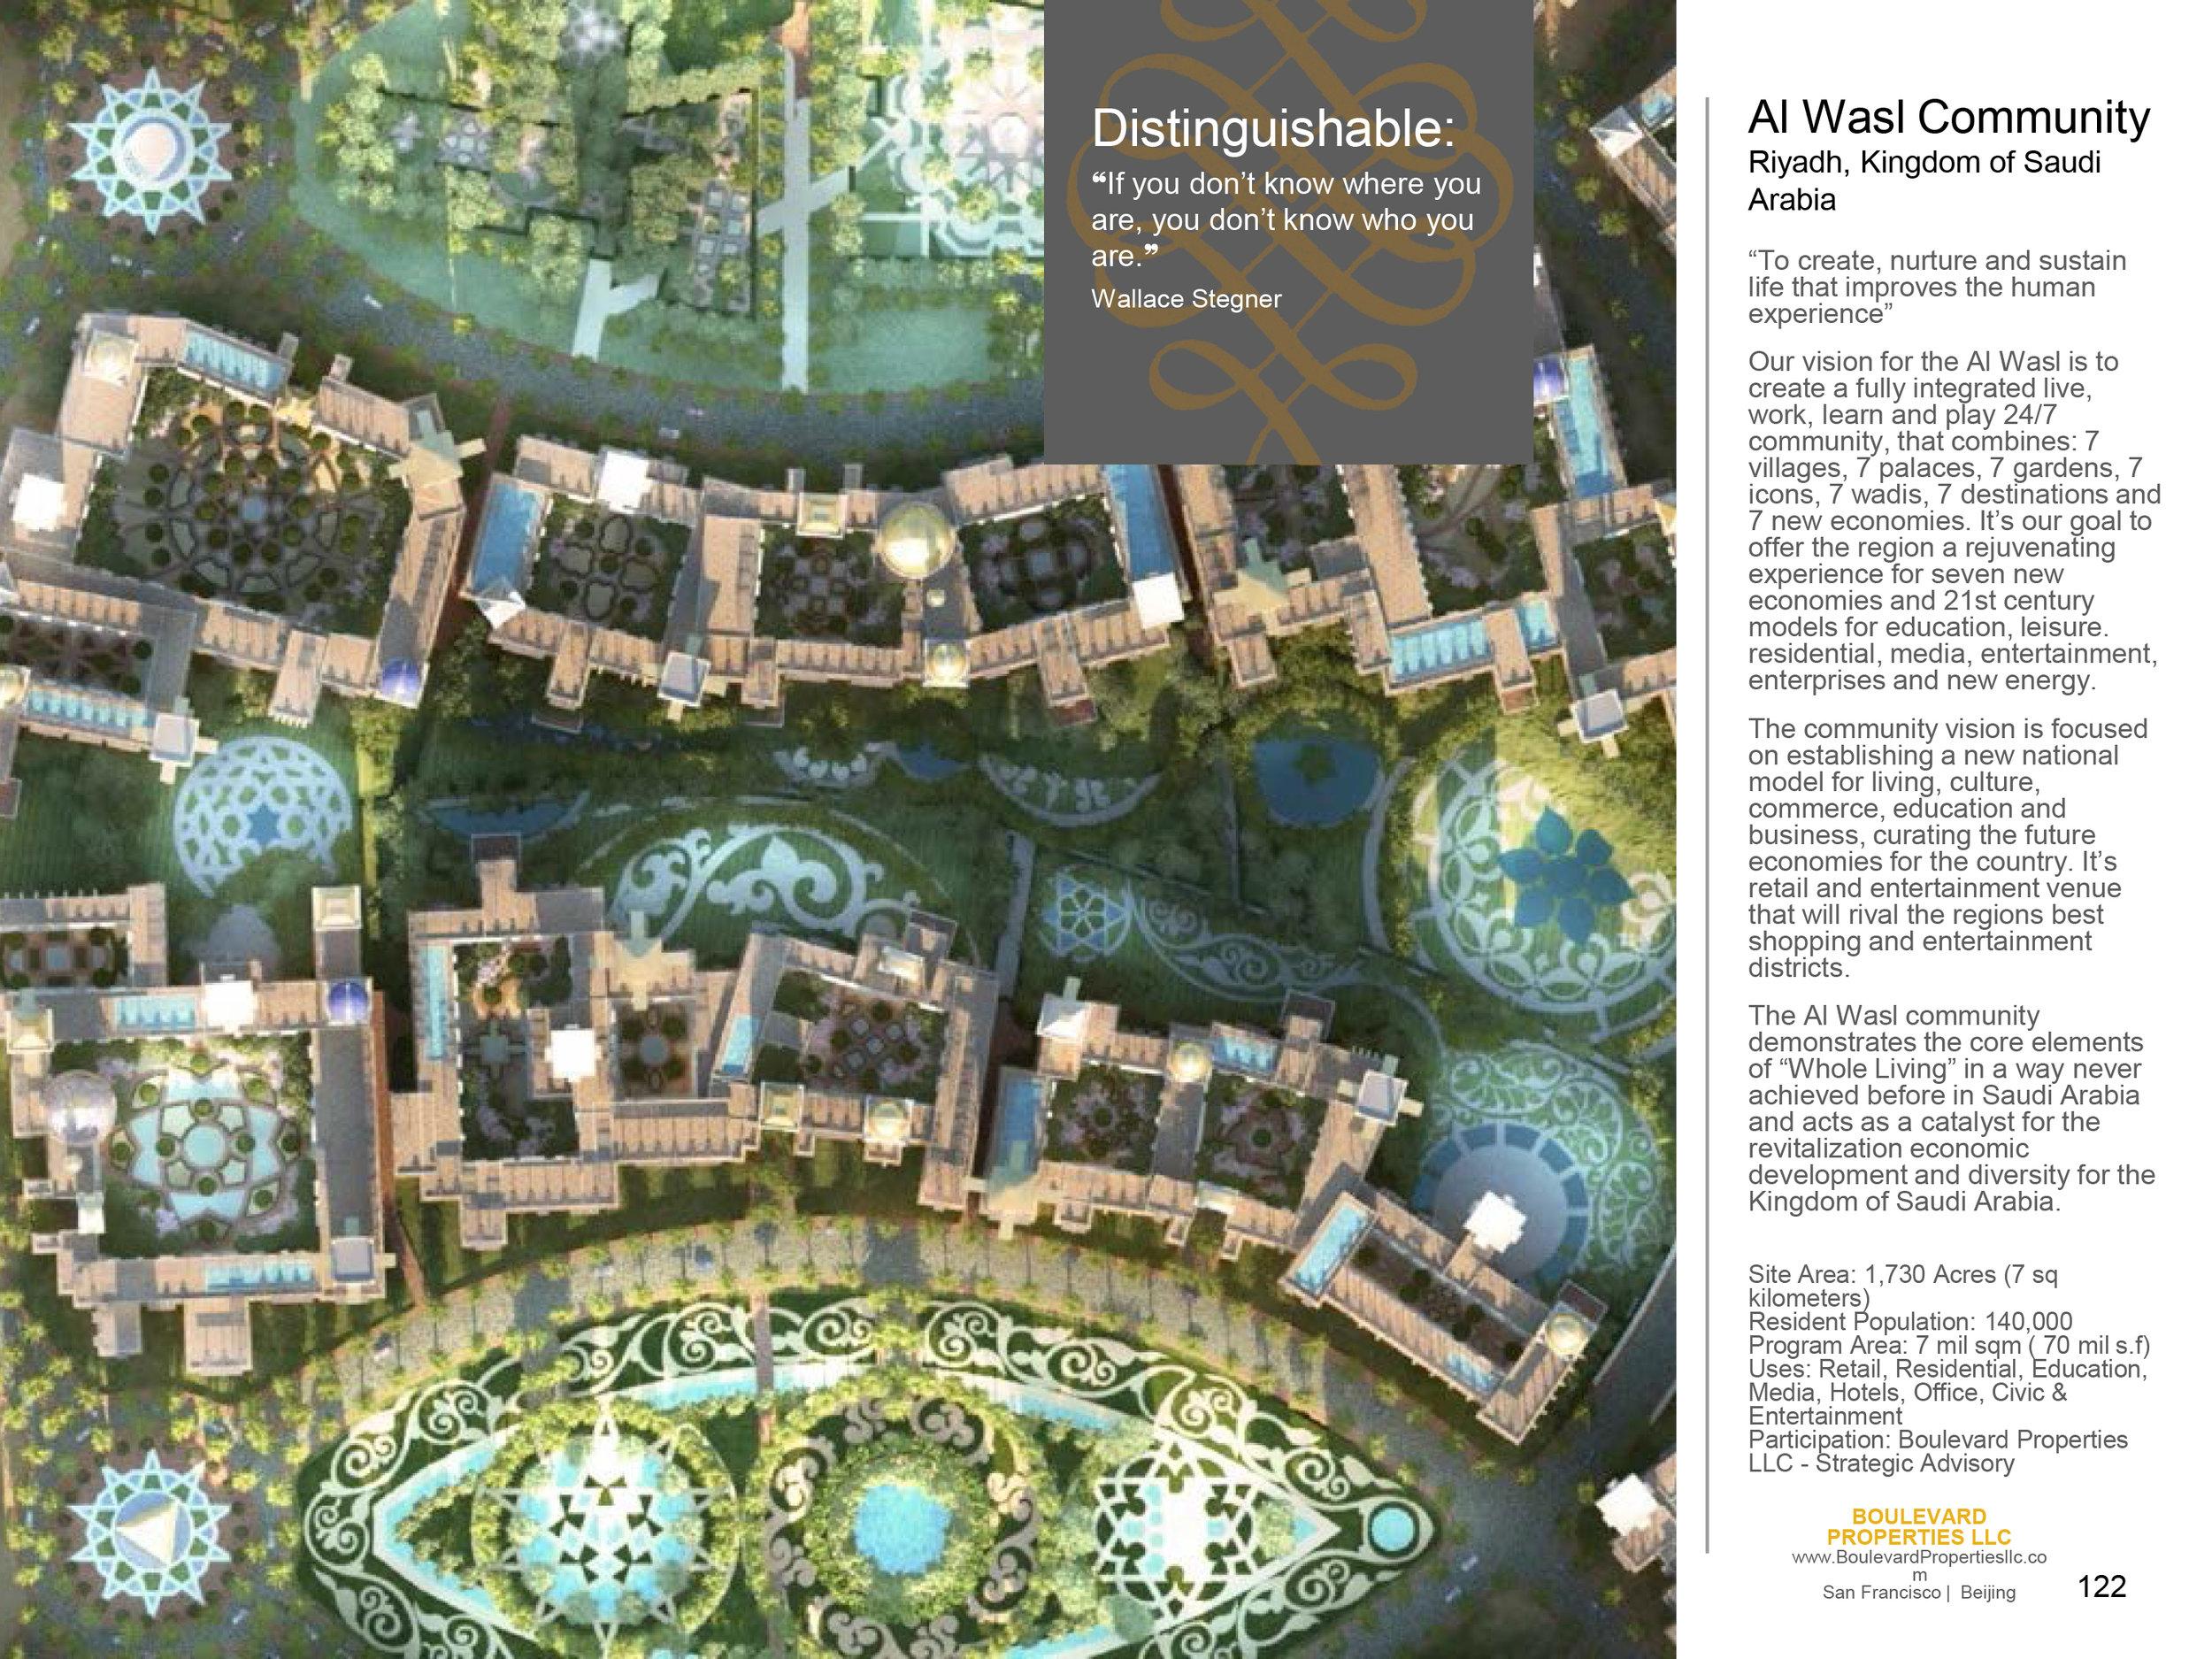 MIT ARCHITECTURE 150 SAN FRANCISCO SLIDESHOW-121 copy.jpg